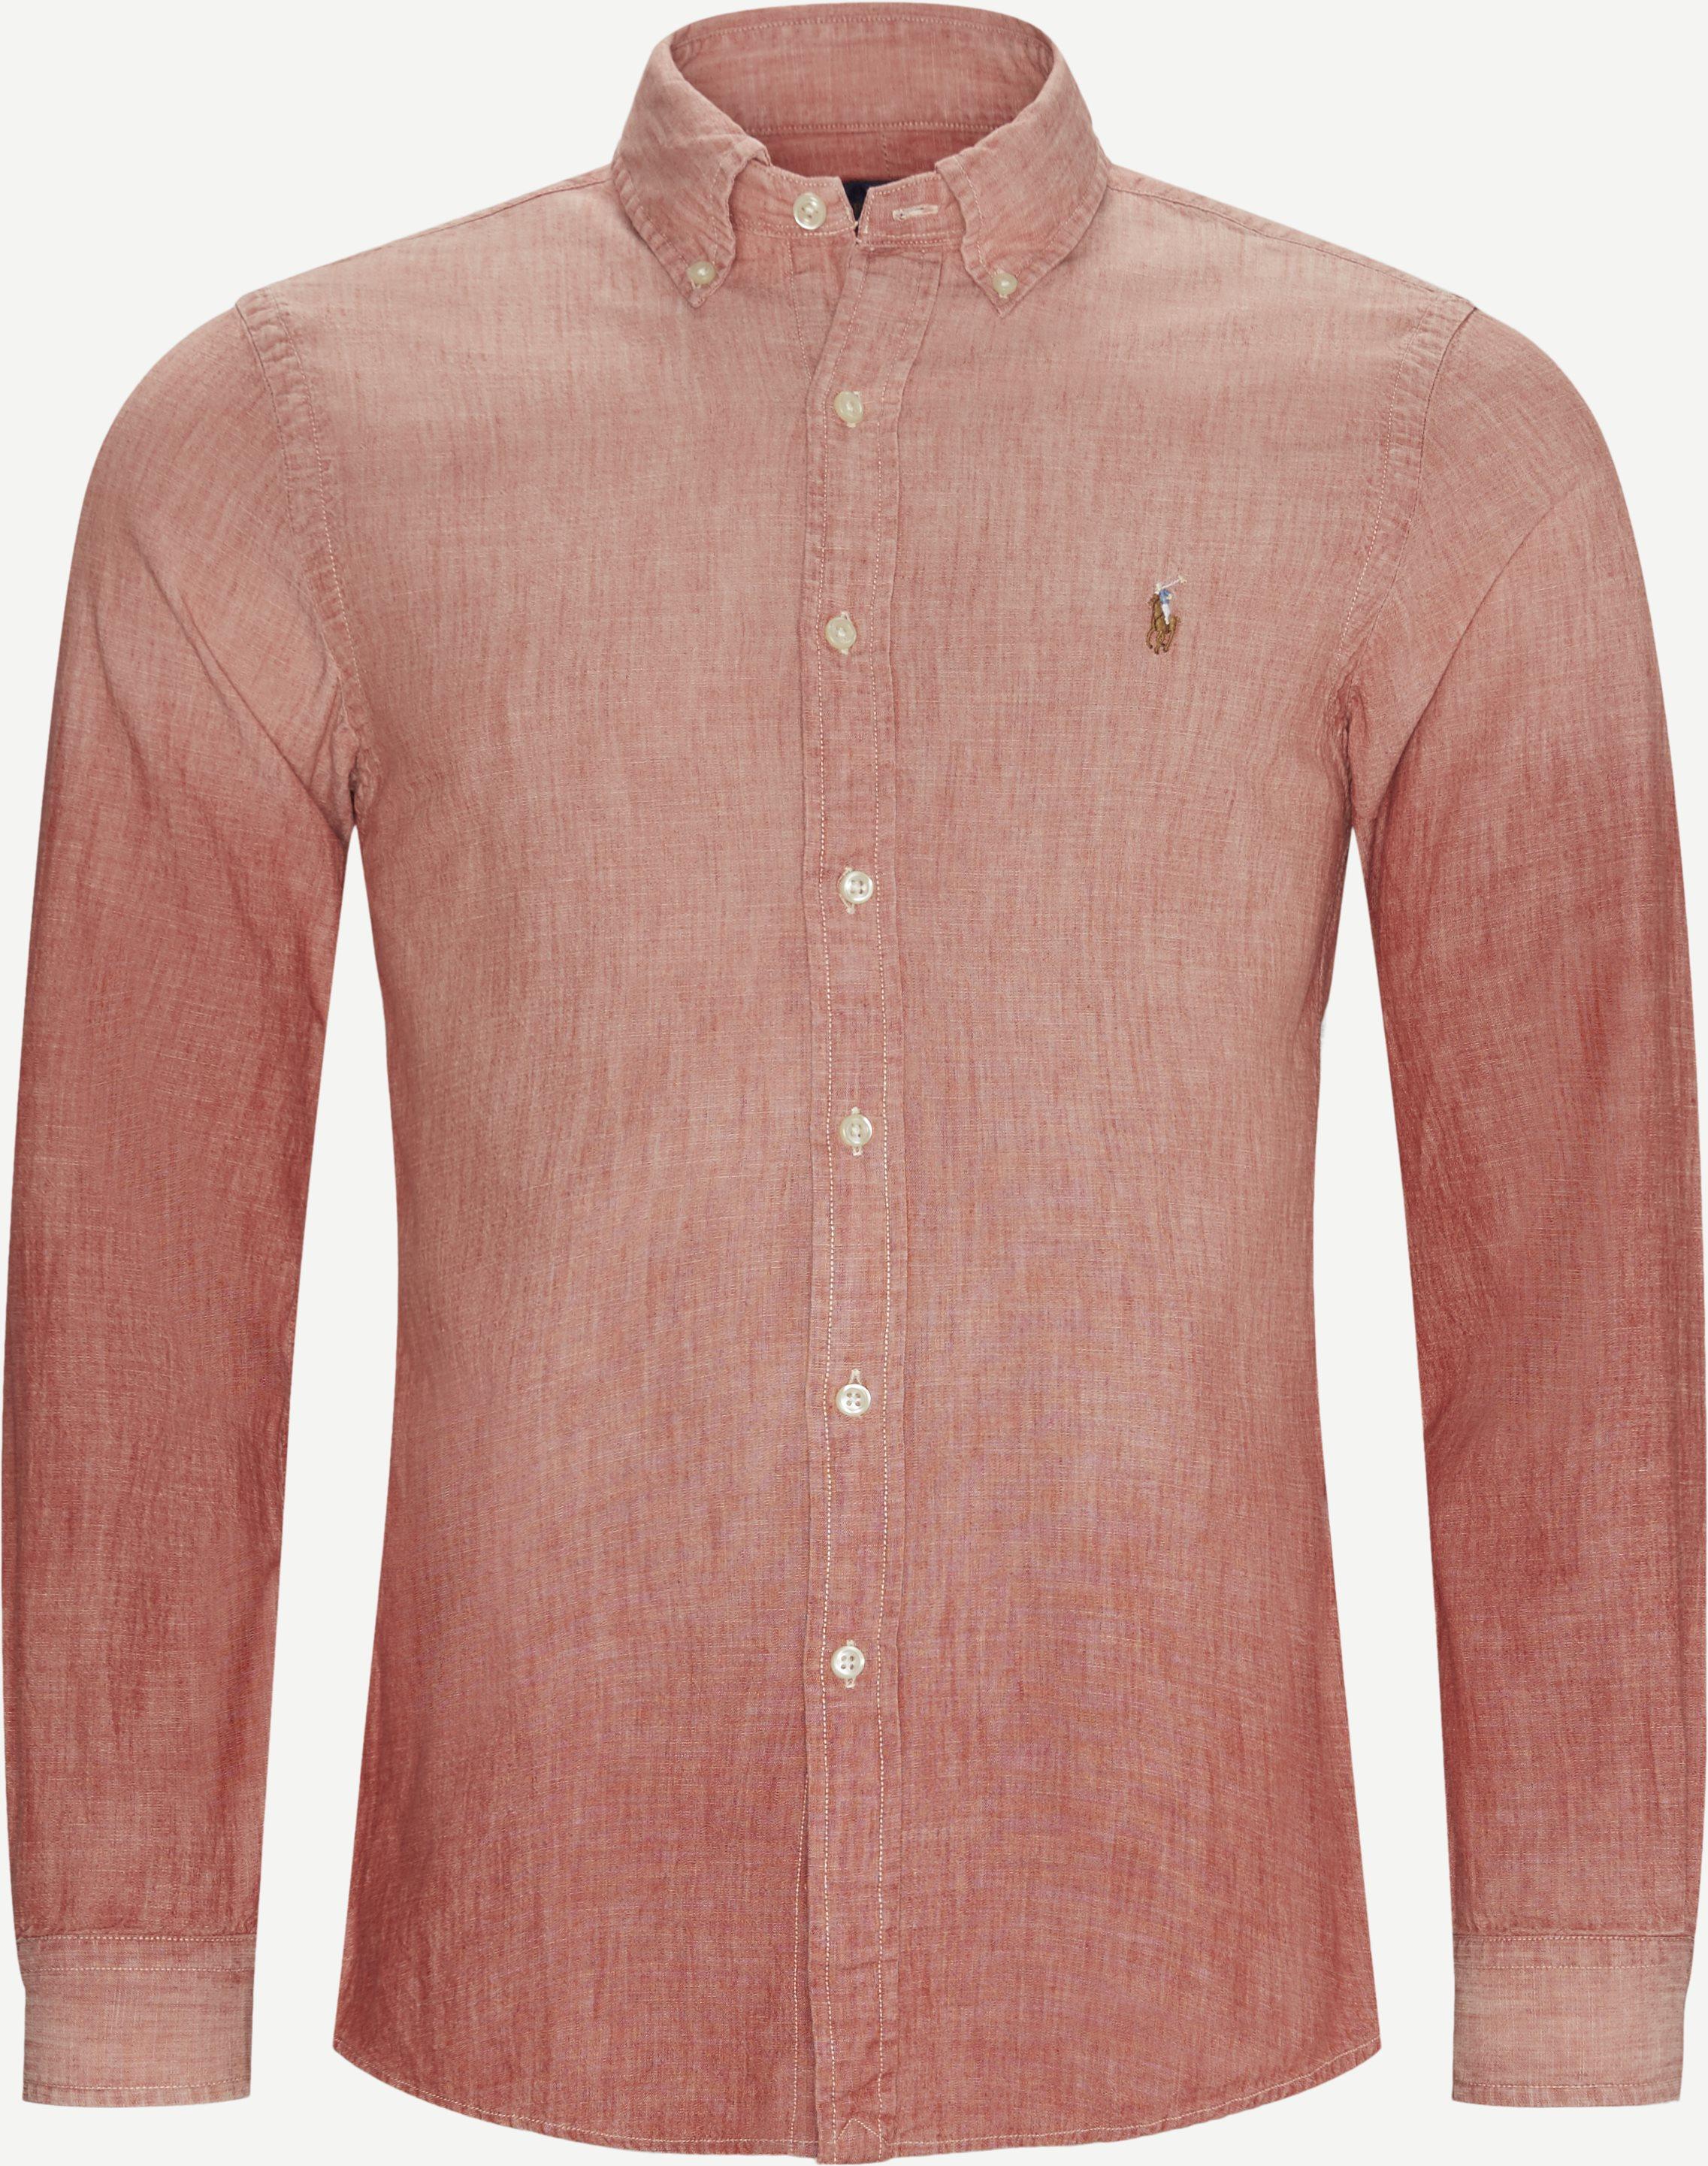 Skjortor - Slim fit - Röd